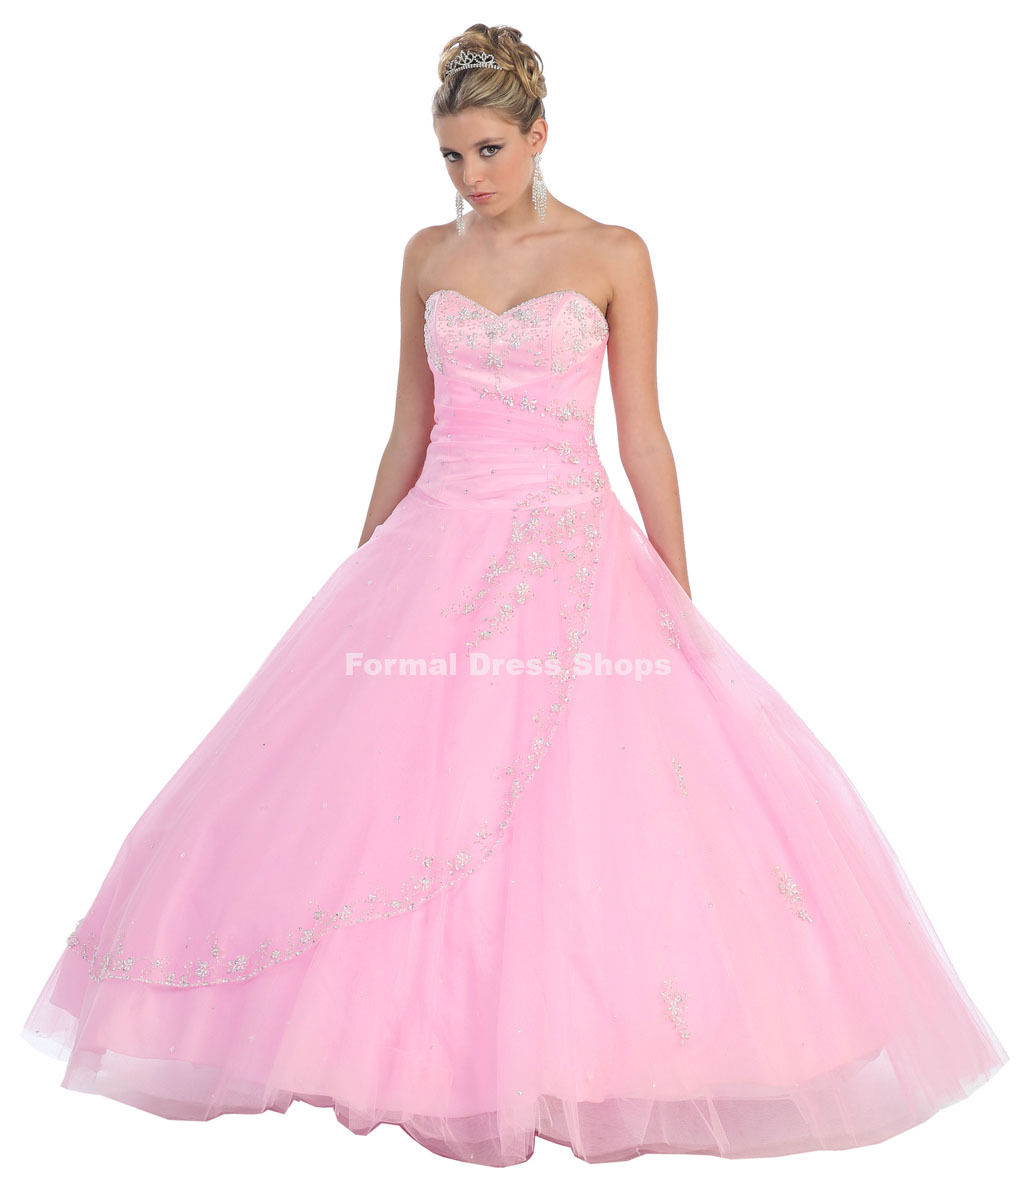 wedding dresses for sale on ebay photo - 1